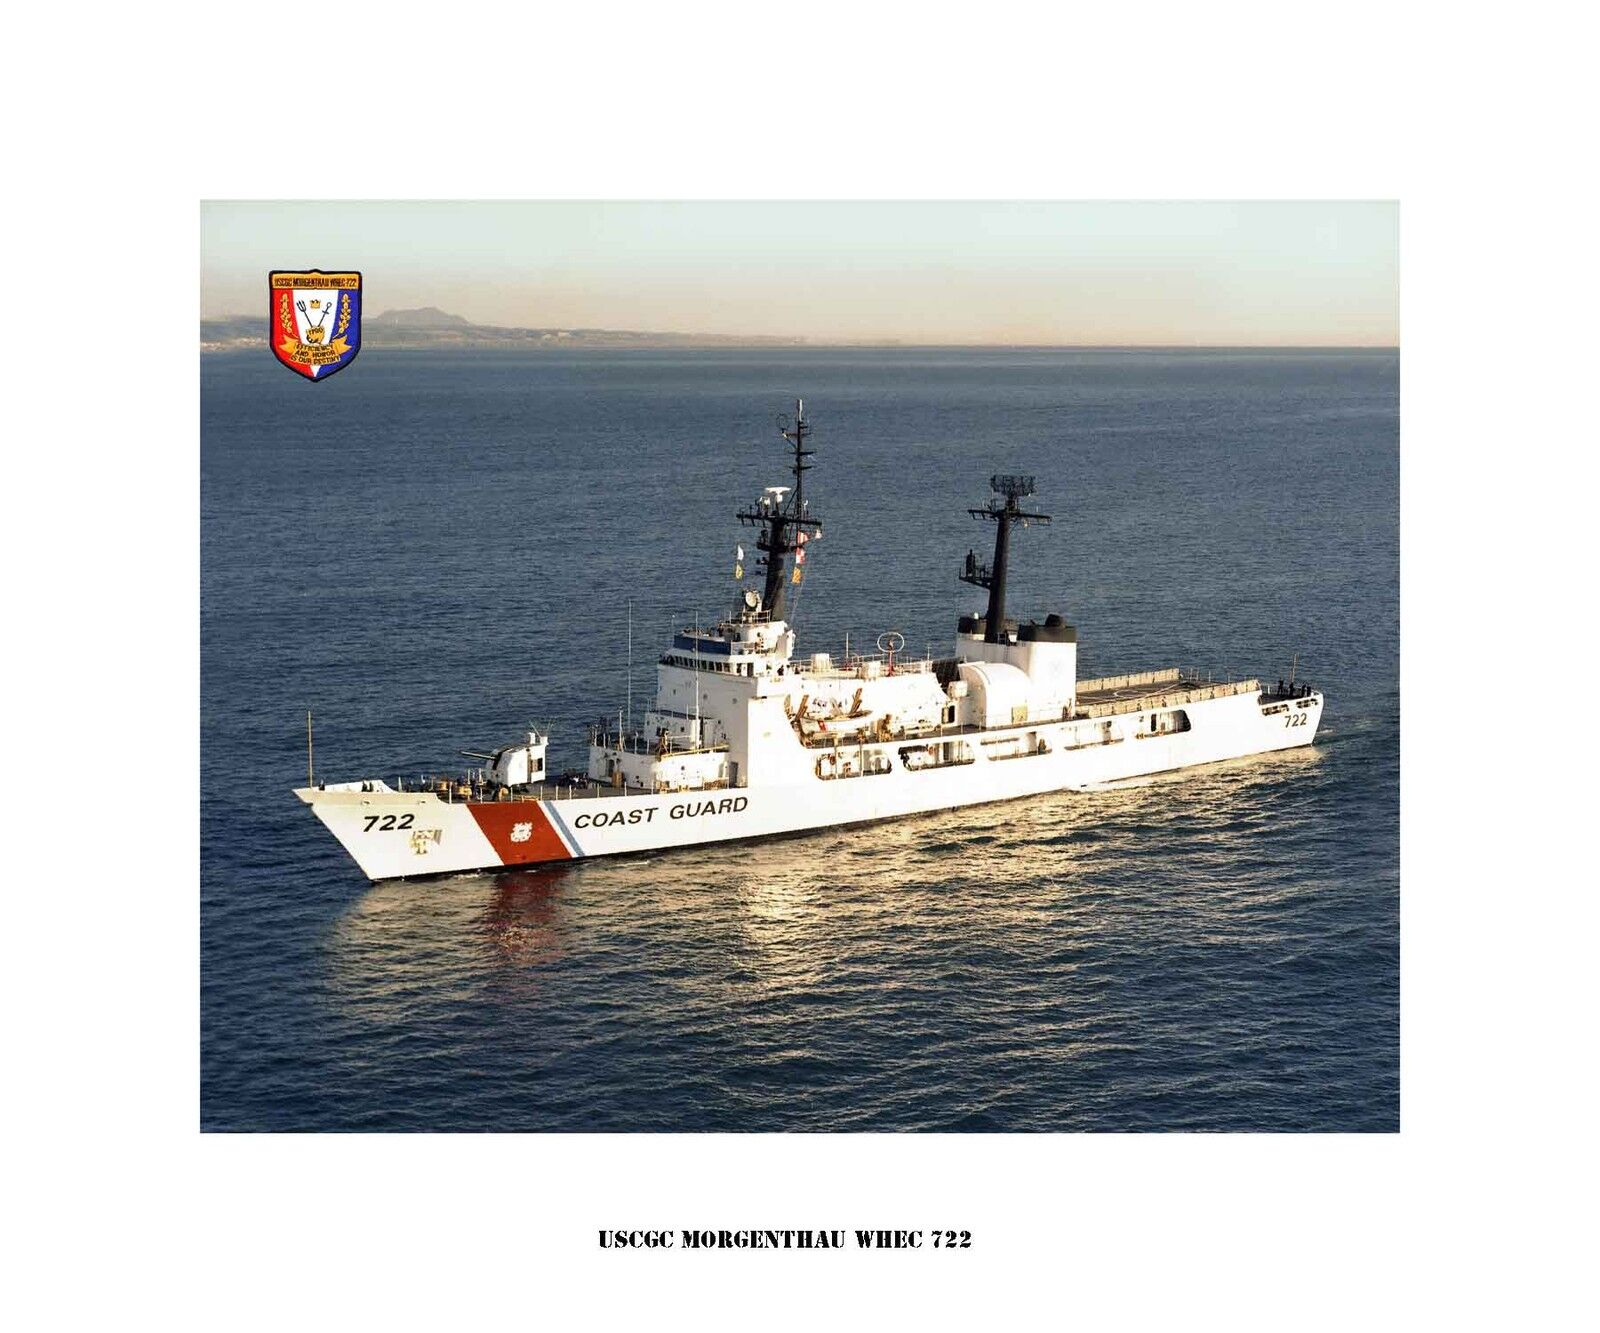 USCGC Morgenthau WHEC 722 USCG Ship